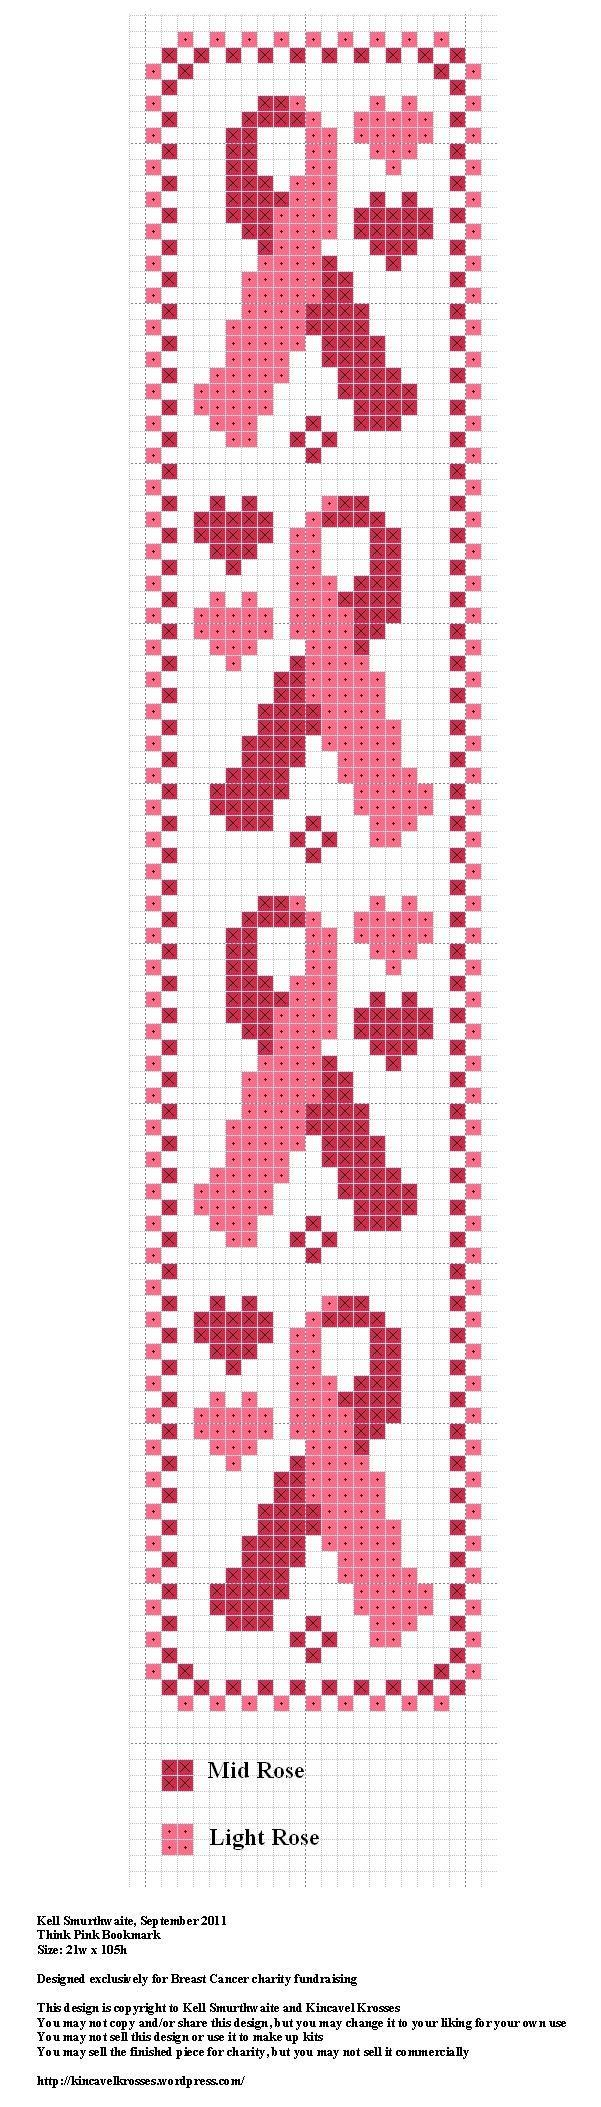 Think Pink Bookmark, designed by @Kell Smurthwaite, from Kincavel Krosses.